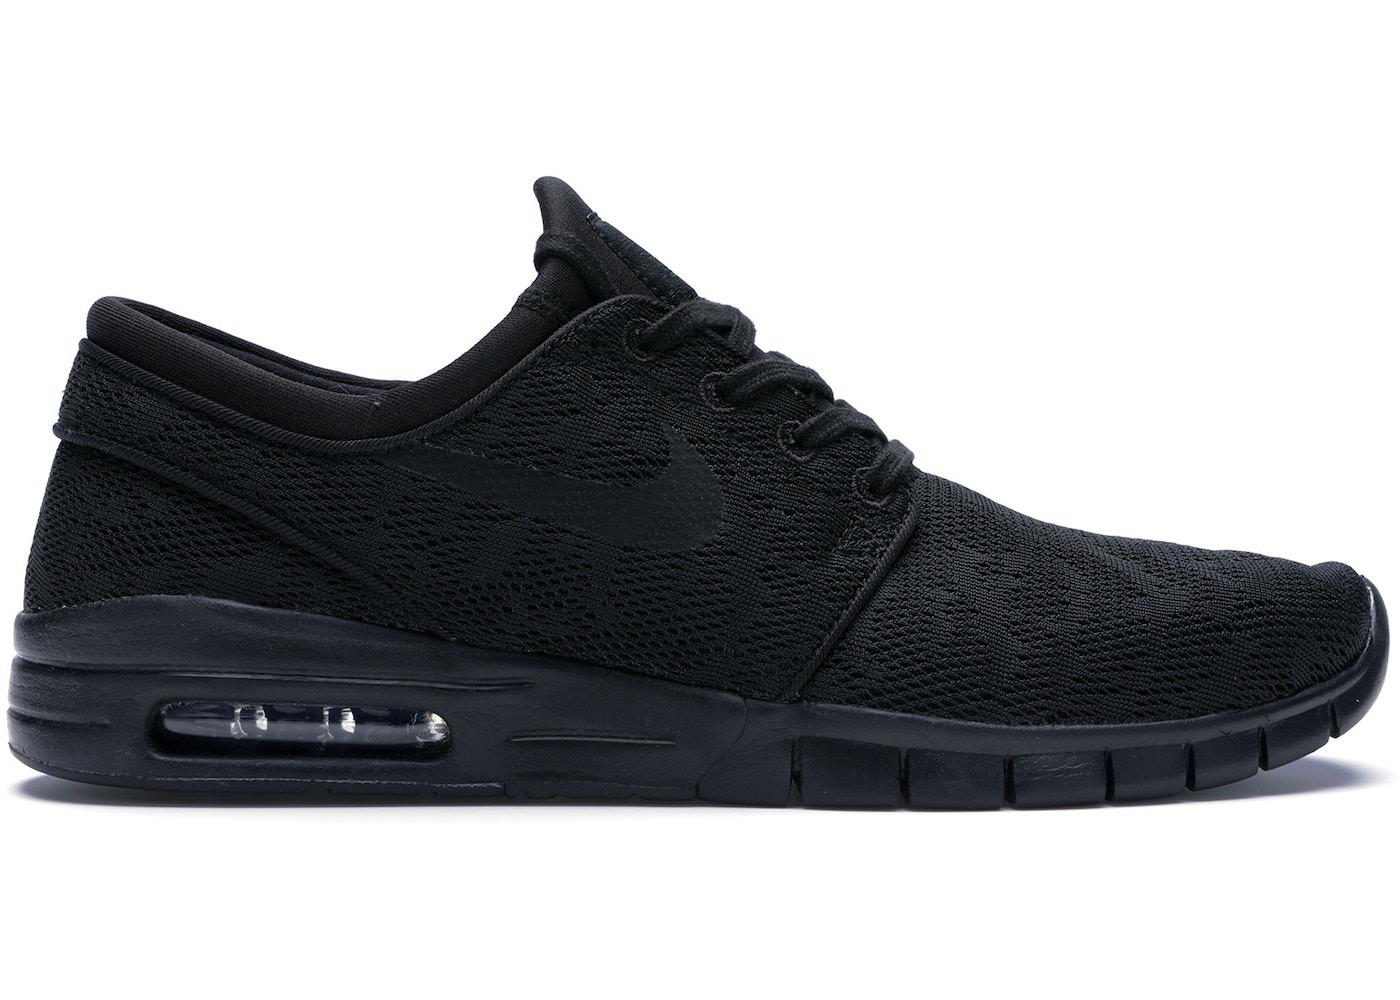 06a2cef72a980 Buy Nike SB Janoski Shoes & Deadstock Sneakers